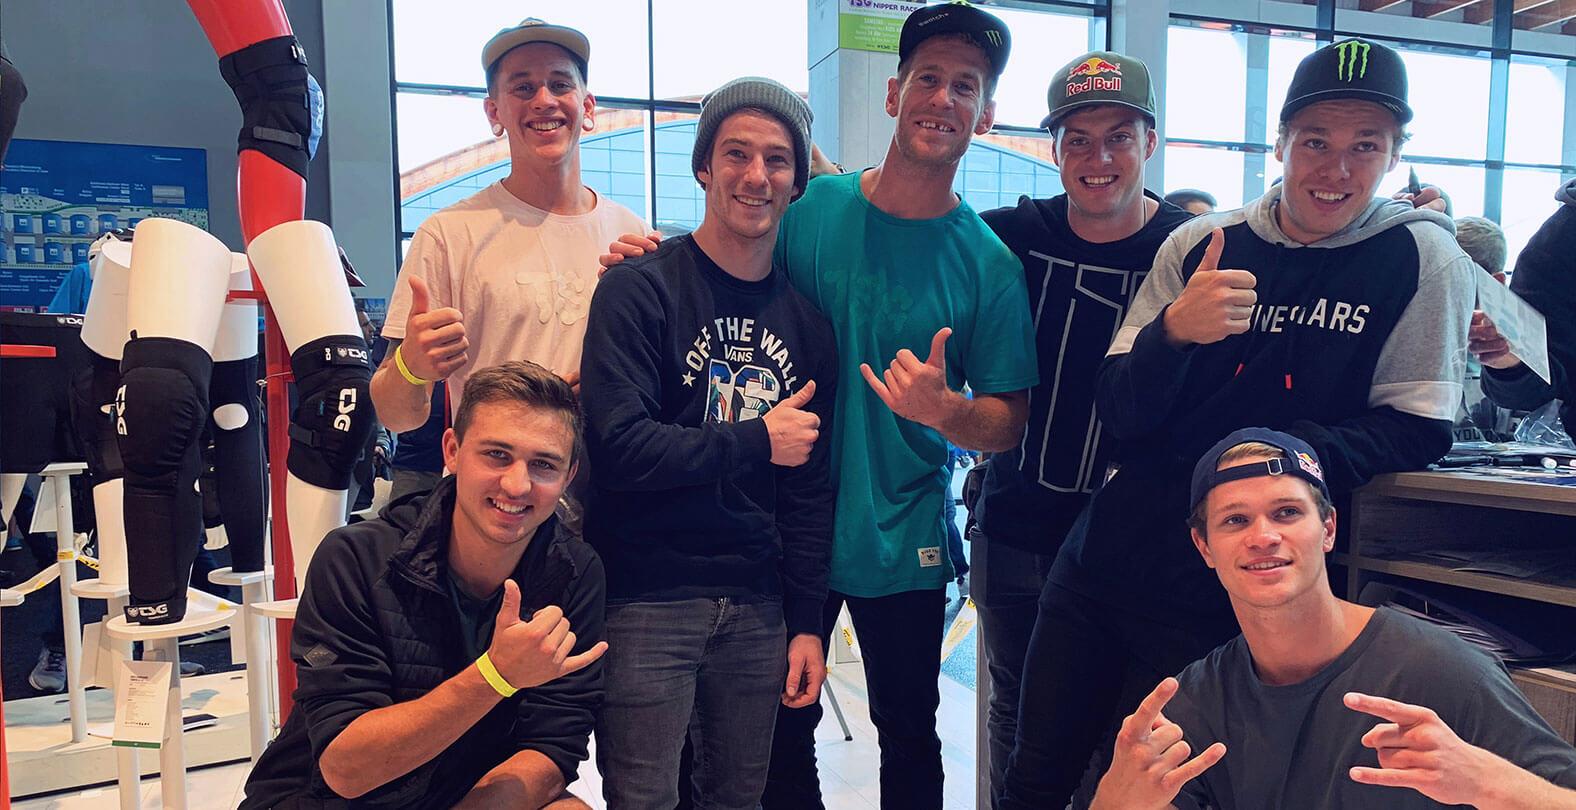 Eurobike 2019 TSG Messestand Team: Sam Pilgrim, Matt Jones, Lukas Schäfer, Lucas Huppert, Erik Fedko, Max Fredriksson, Maxime Vinchent